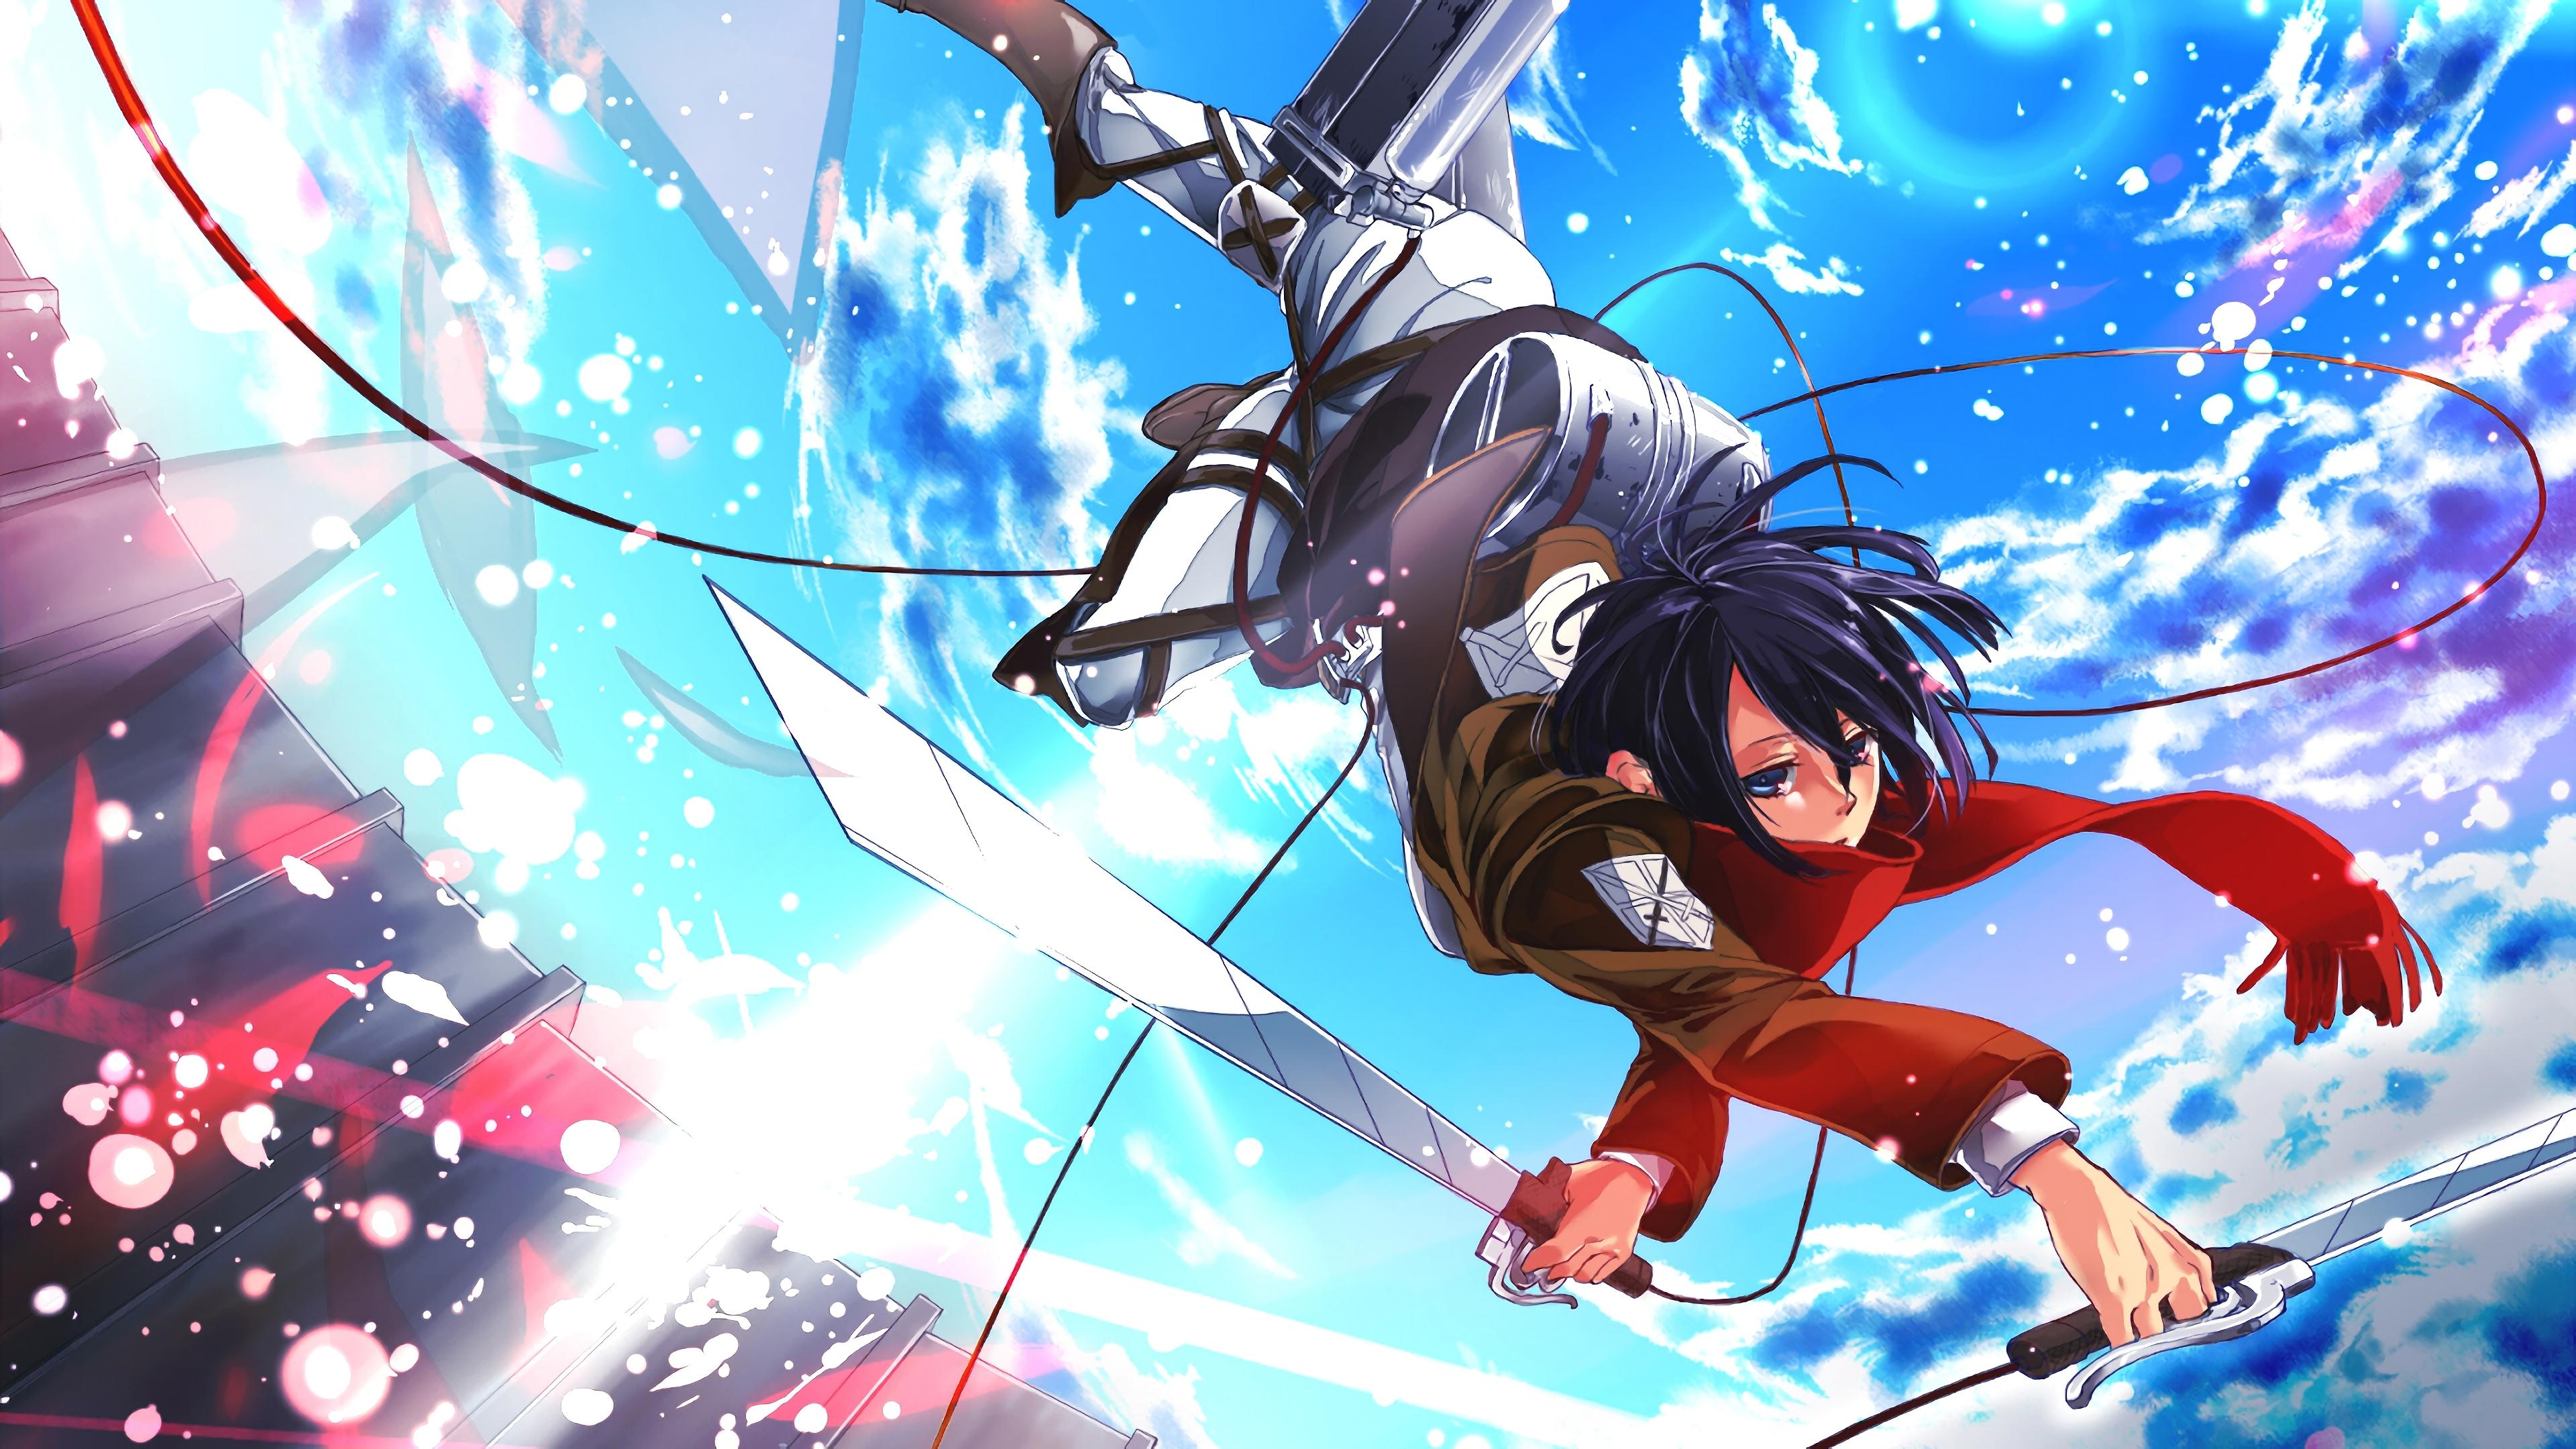 Dual, kyojin, multi, shingeki, 3840x1080, 132518. Mikasa, Attack on Titan, 4K, #148 Wallpaper